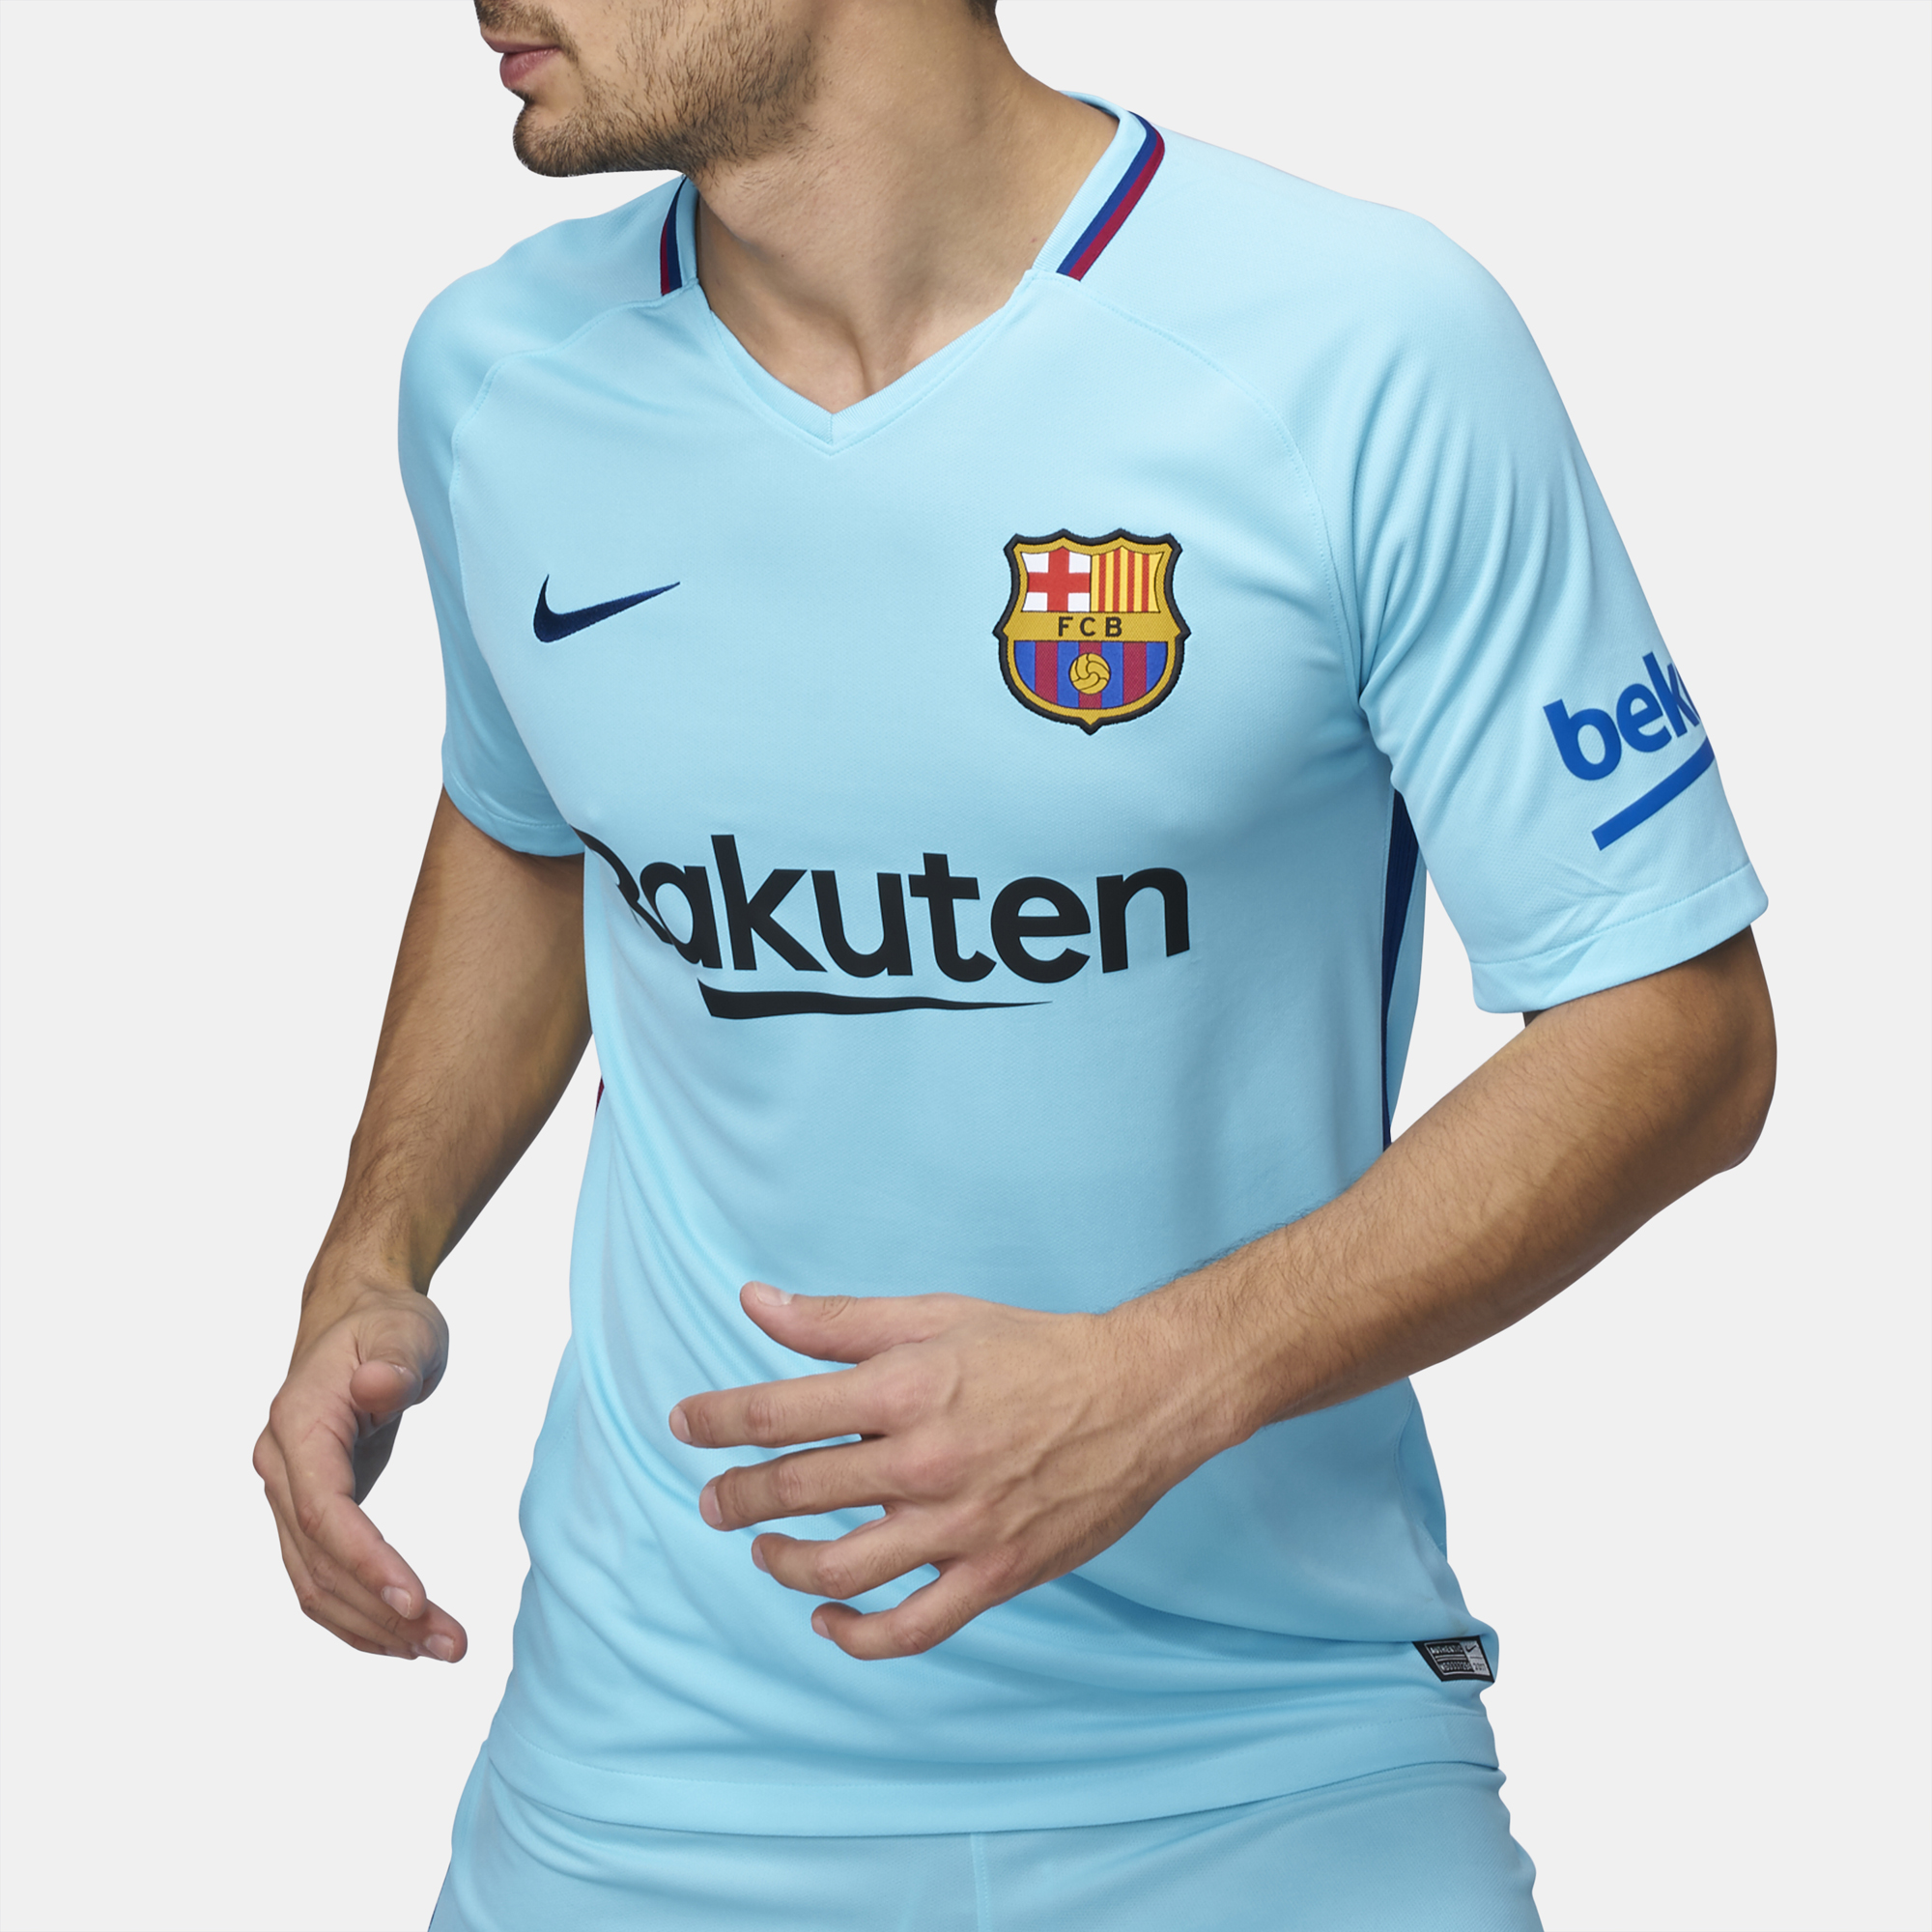 5970fc9f5 Shop Blue Nike FC Barcelona Stadium Away Football Jersey – 2017 2018 ...